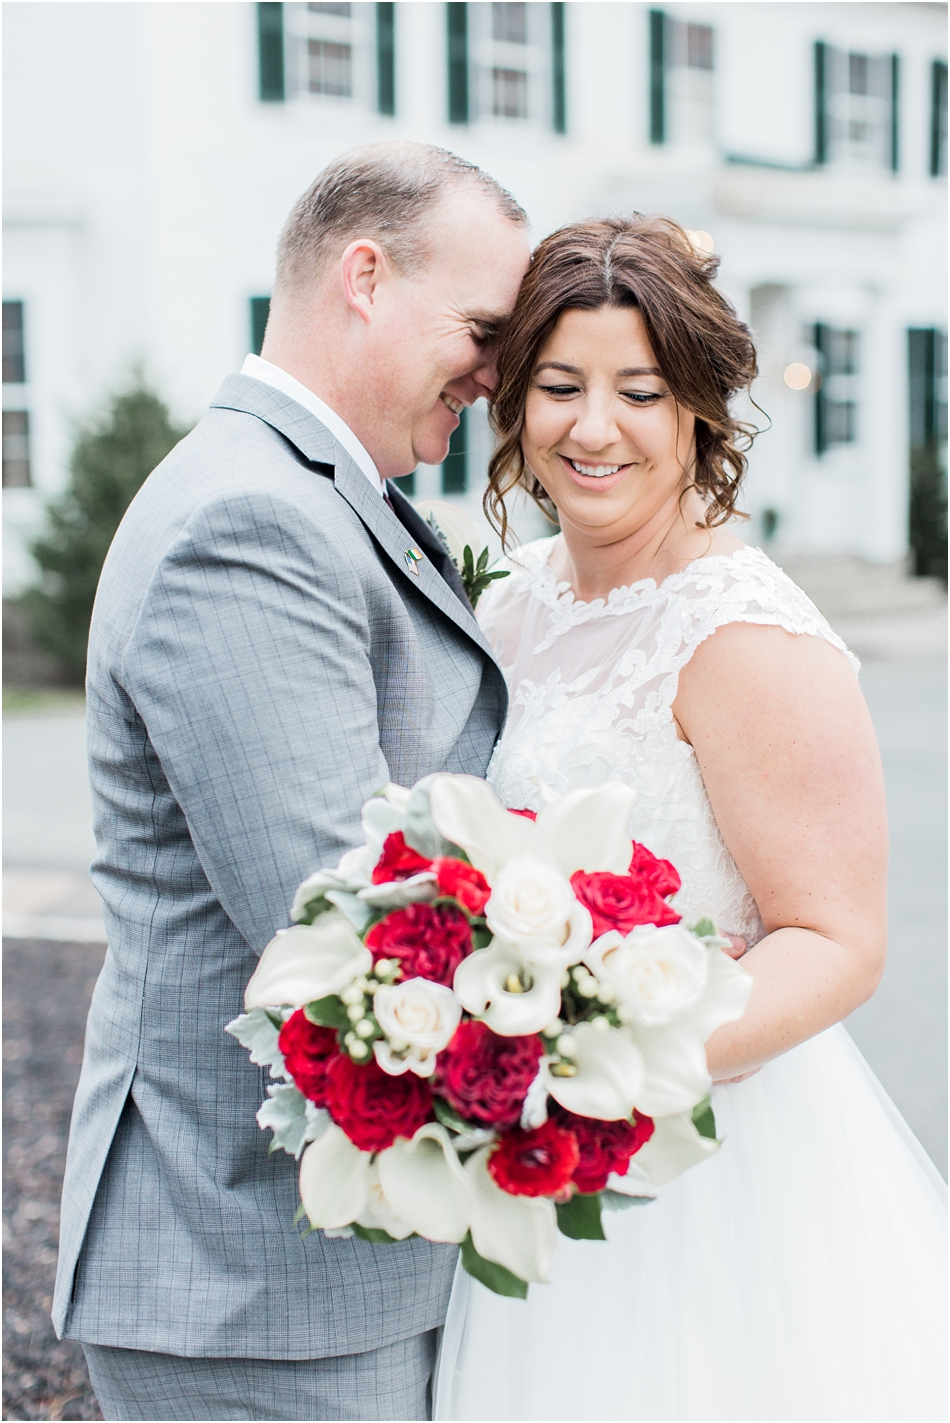 peirce_farm_winter_christmas_jessica_john_cape_cod_boston_new_england_wedding_photographer_Meredith_Jane_Photography_photo_0325.jpg